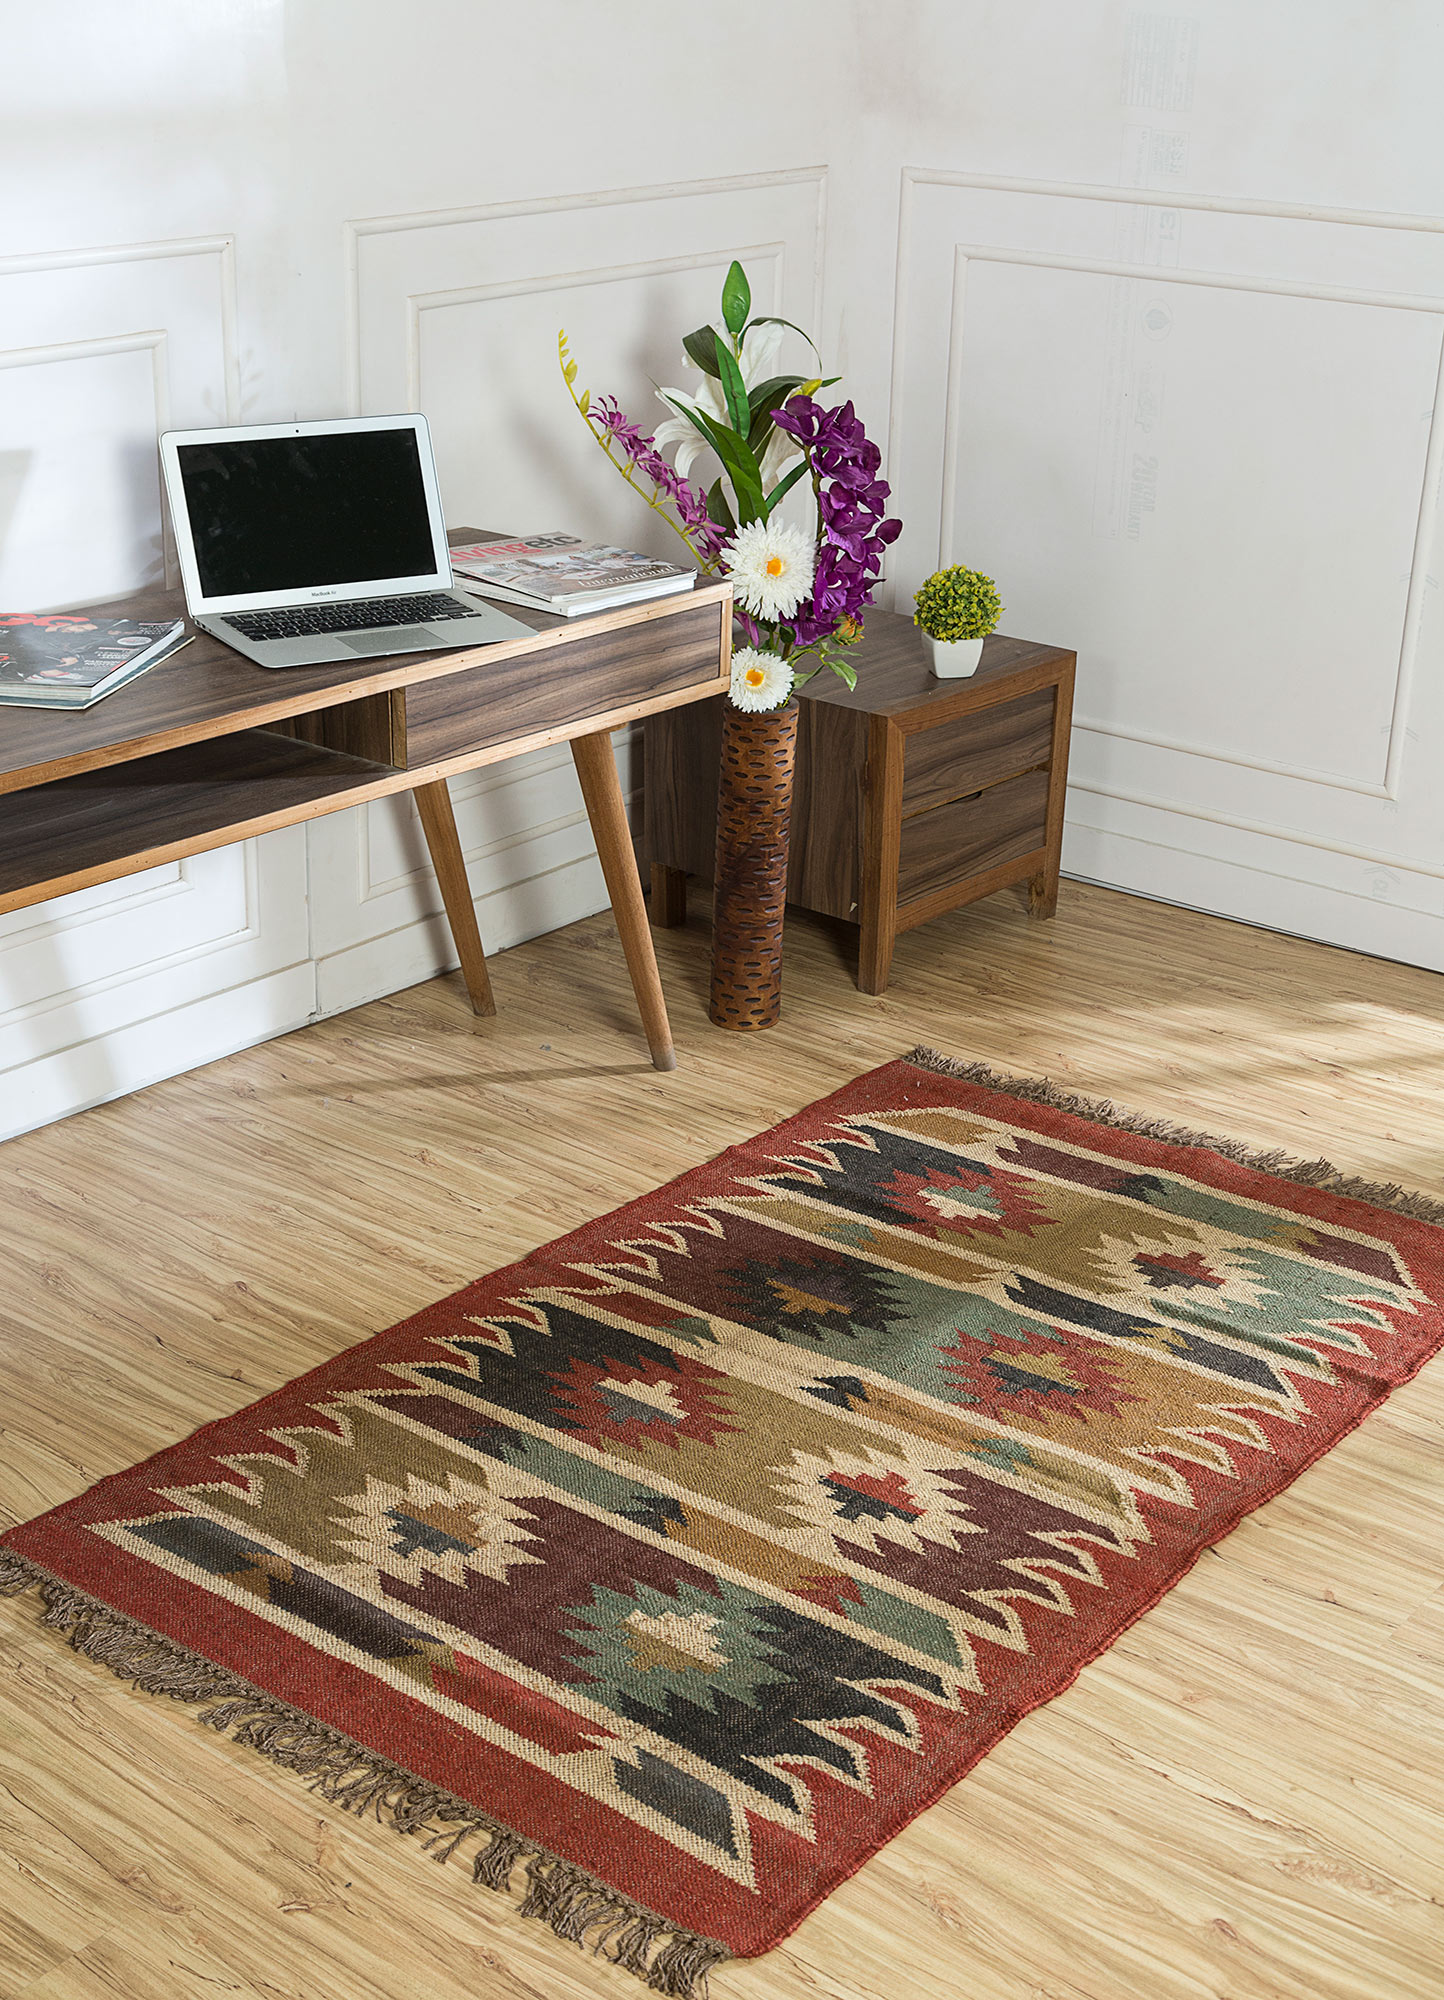 bedouin red and orange jute and hemp jute rugs Rug - RoomScene